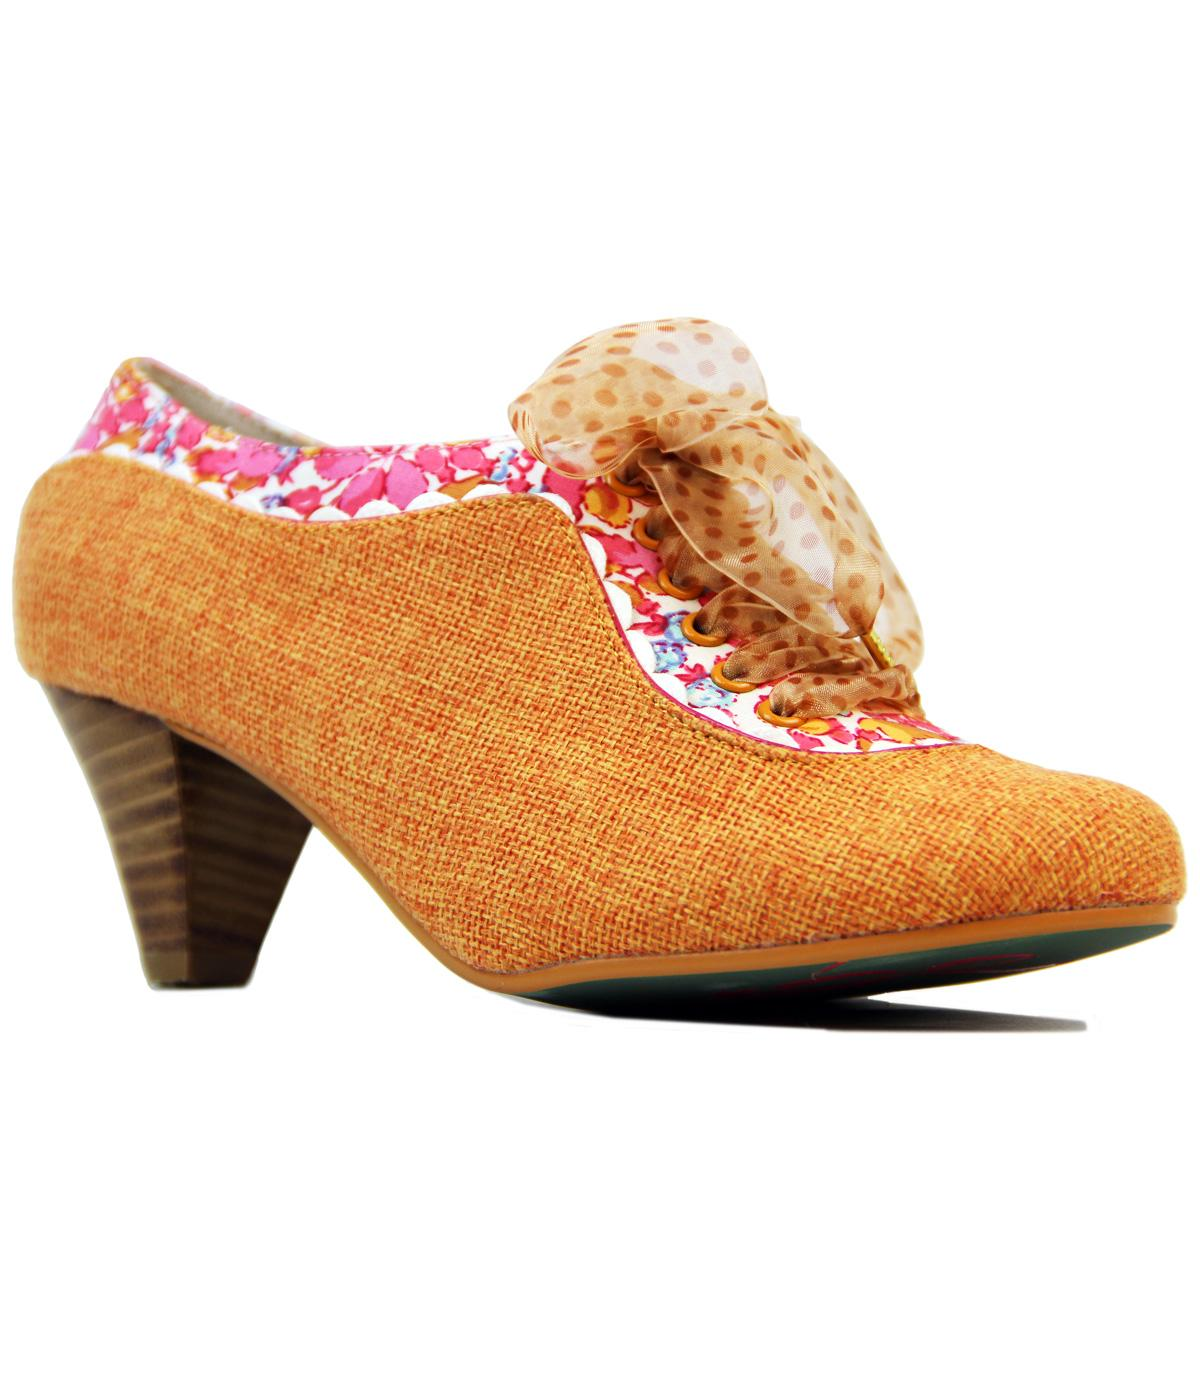 Whiplash POETIC LICENCE Vintage Floral Trim Heels